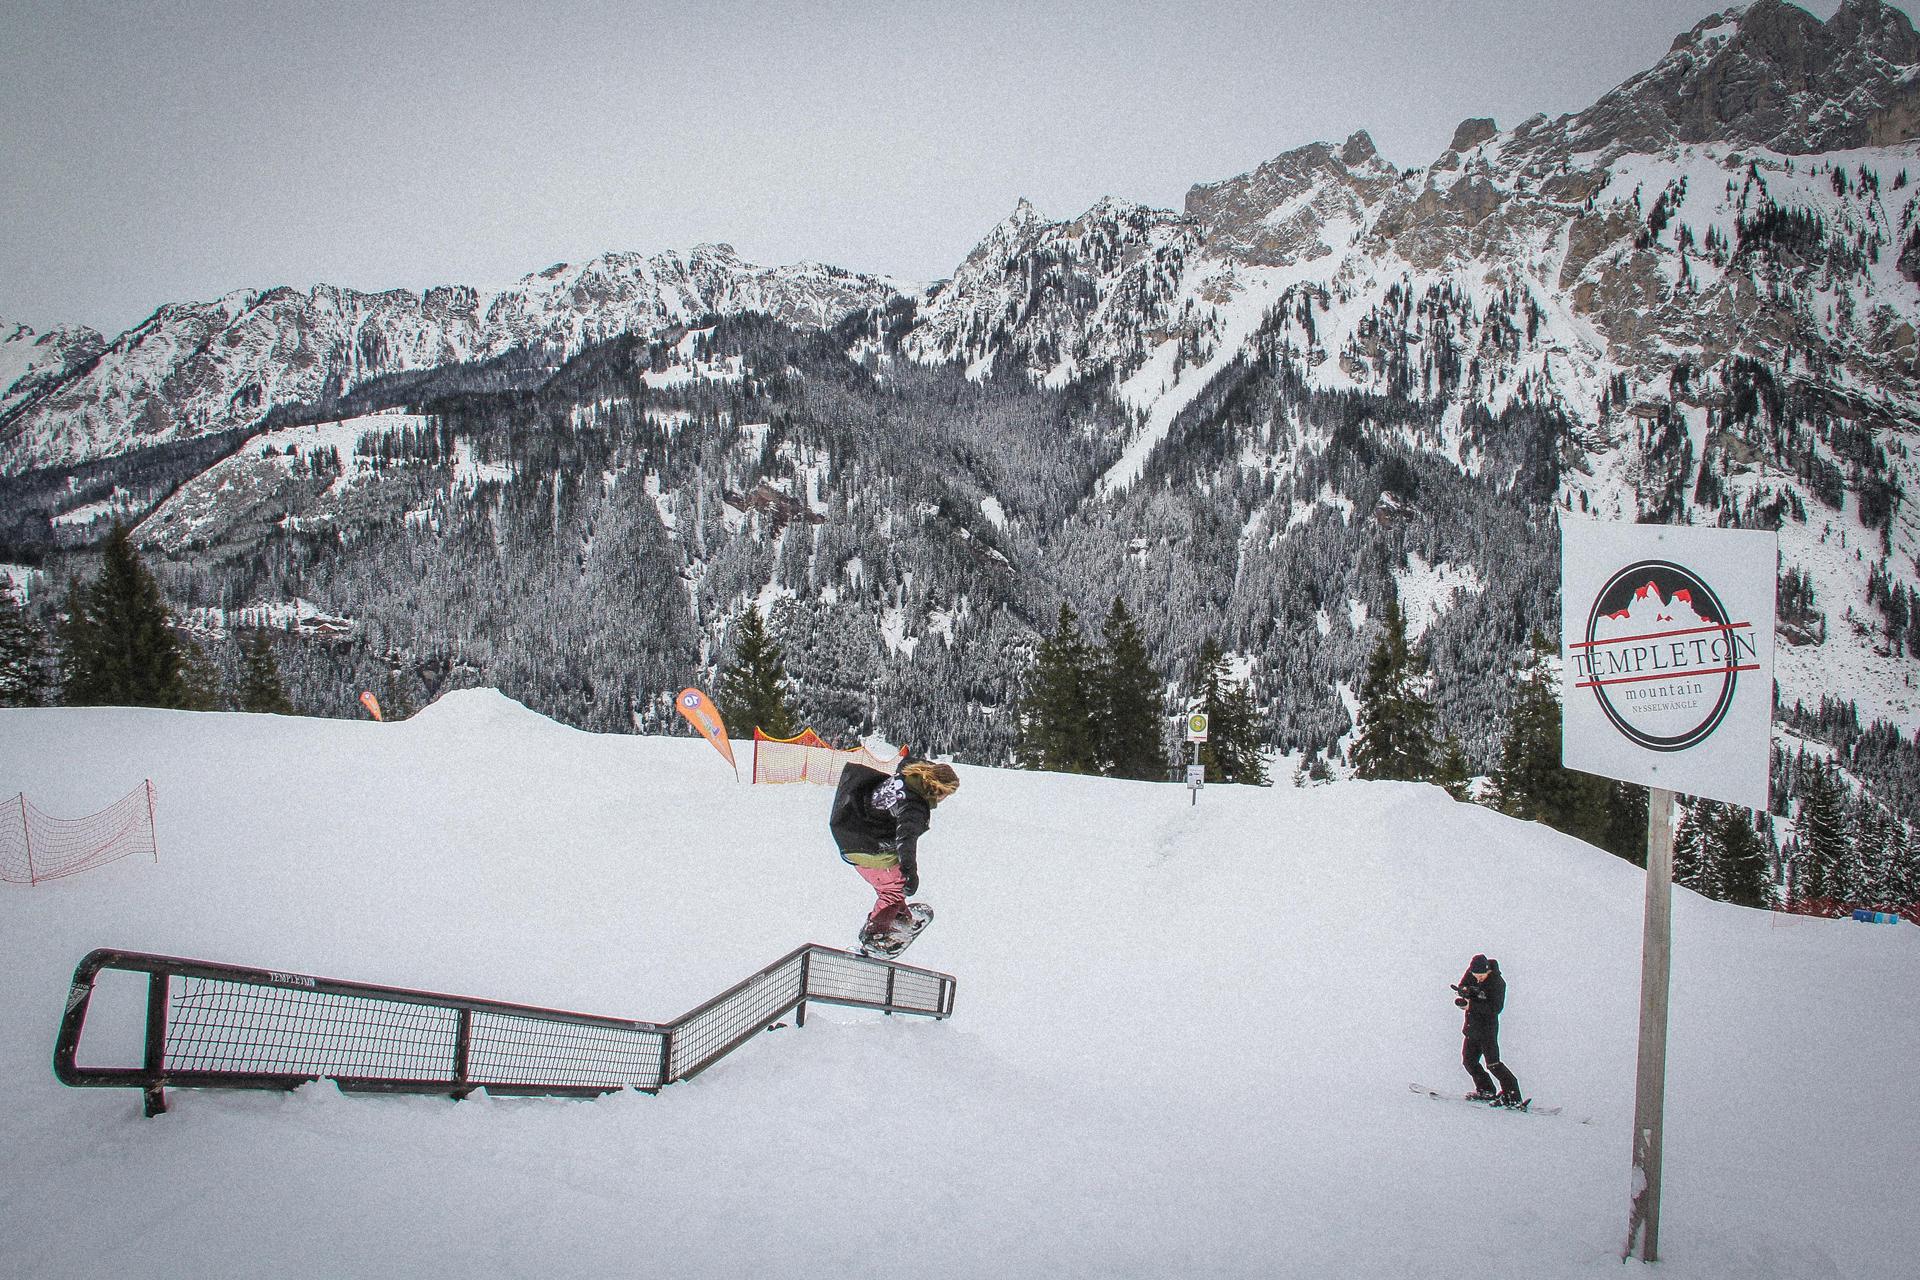 Neuer Snowpark in Nesselwängle (Tannheimer Tal) - Golden Groves - Foto: Michael Dörfler